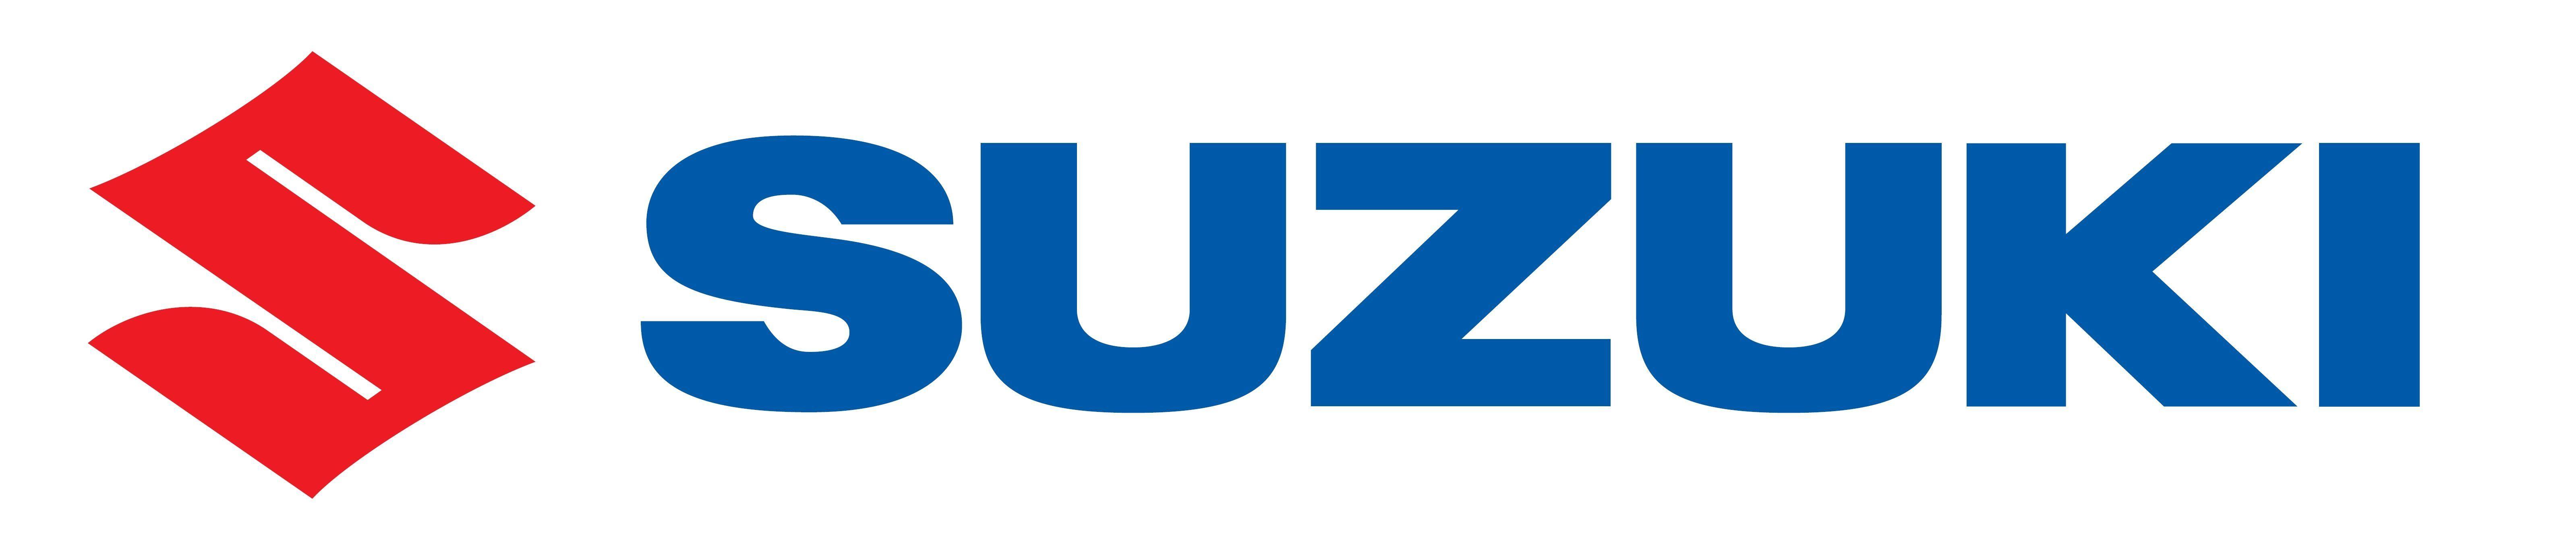 Suzuki Logo Horizontal Jpeg 6396 1366 Suzuki Motor Motor Logo Suzuki Gsxr